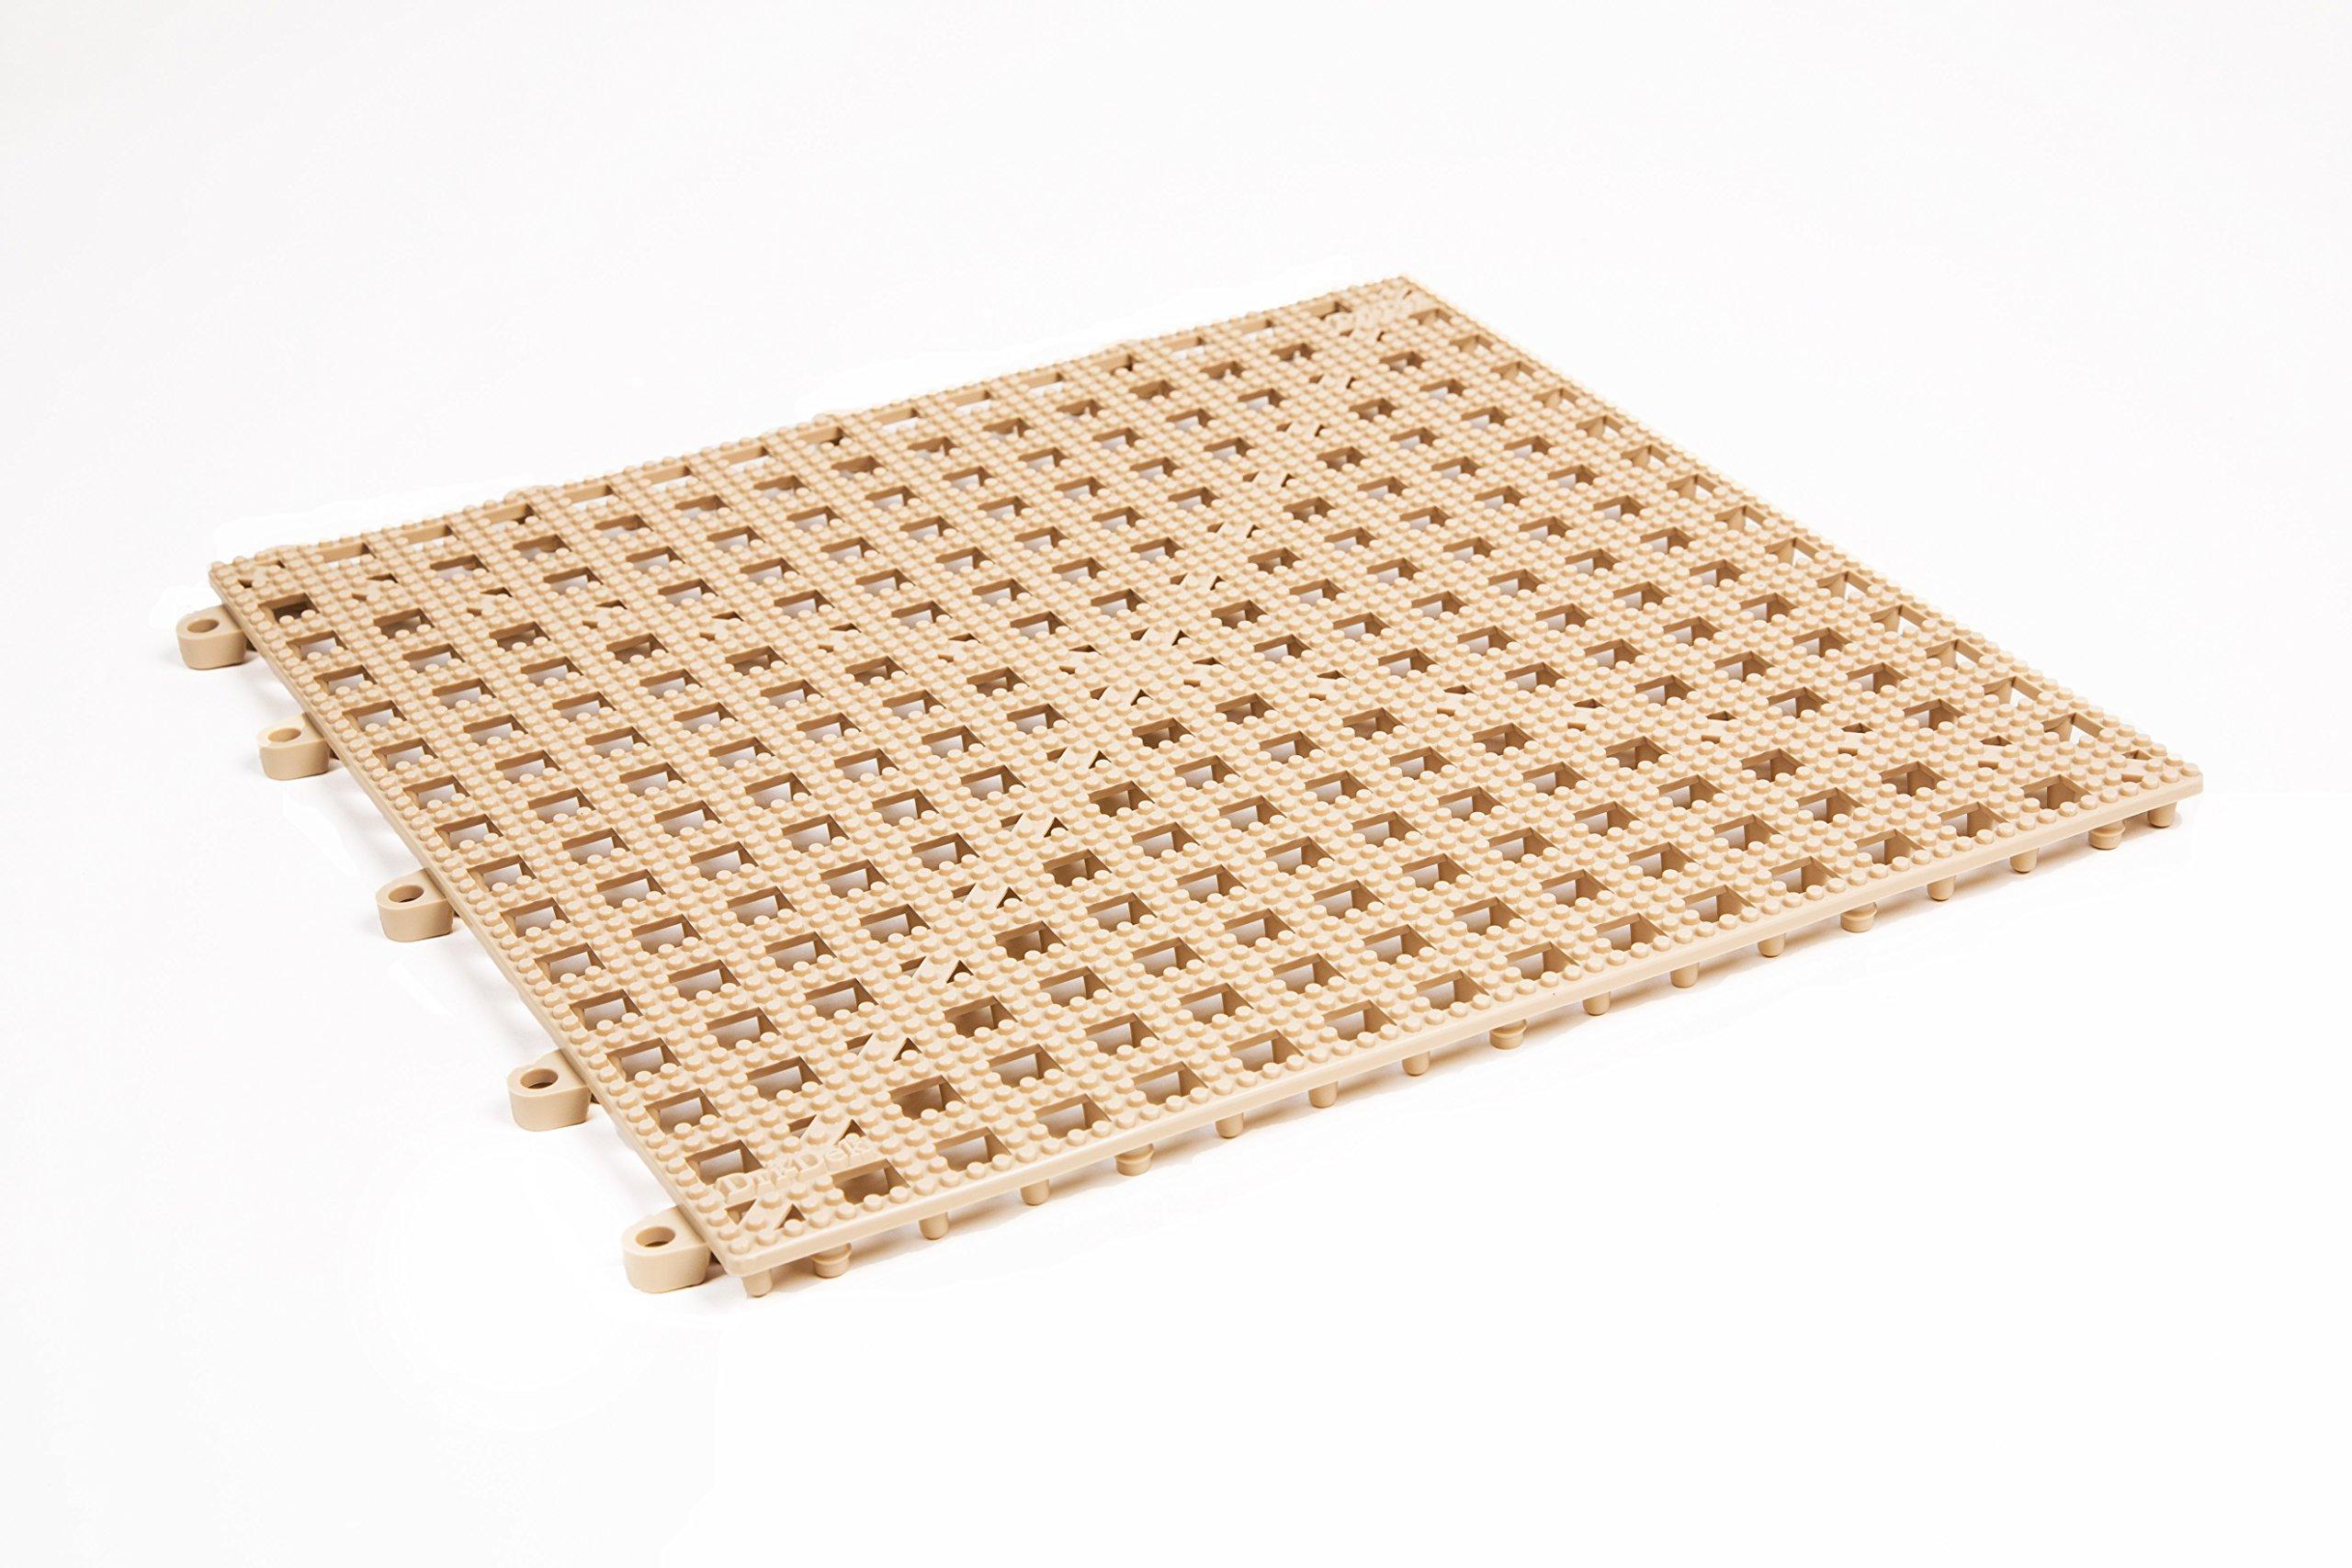 Dri-Dek 1'x1' Interlocking Tiles - Flexible Patio, Porch, Lanai, Balcony, Basement & Pool Deck Flooring (1'x1' Tiles - 25-Pack, Almond)